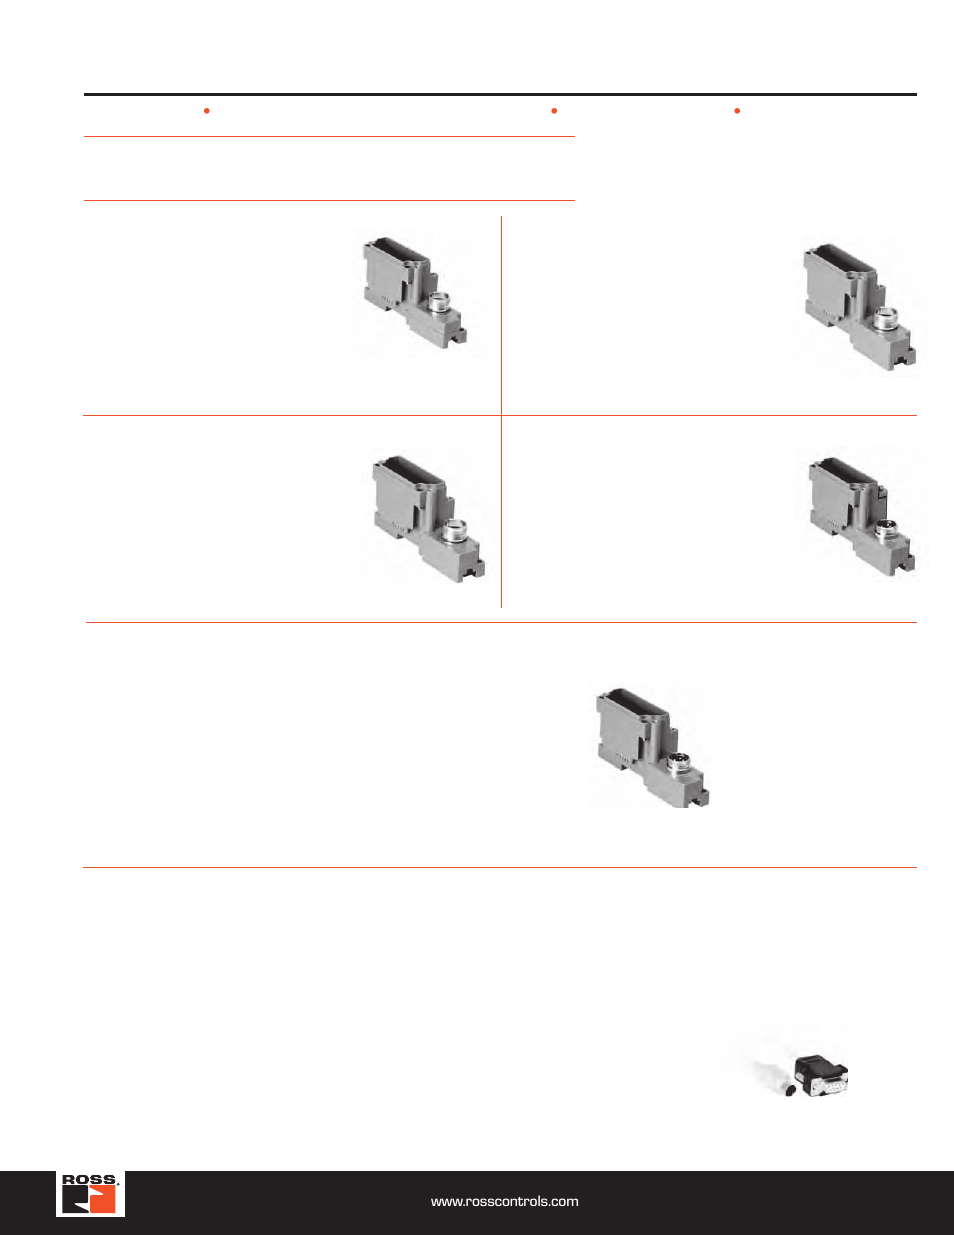 Turck modular industrial i/o system bl 67, Base modules for bl67 i/o